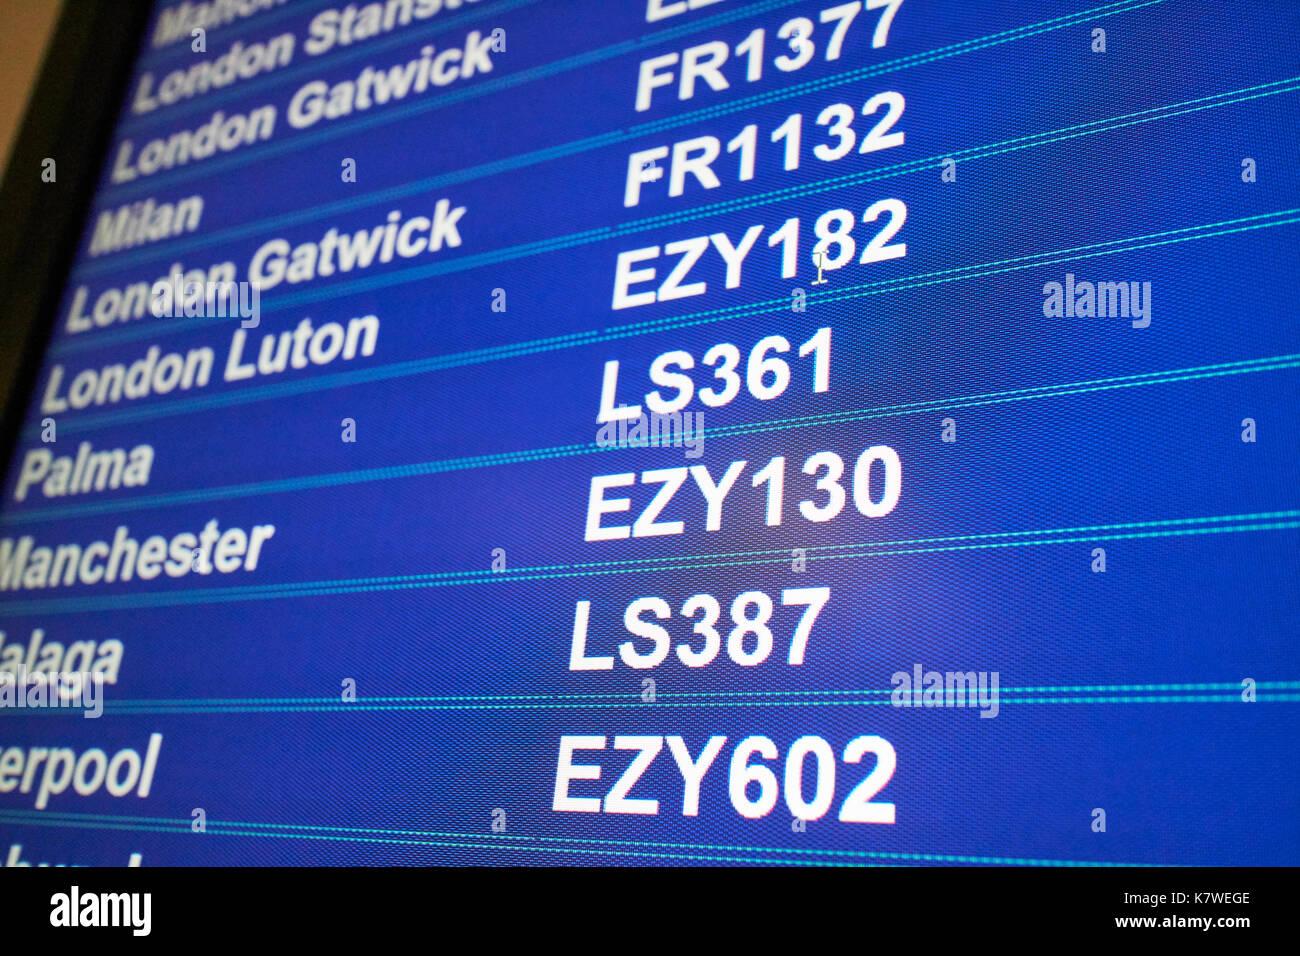 Easyjet Ryanair Stock Photos & Easyjet Ryanair Stock